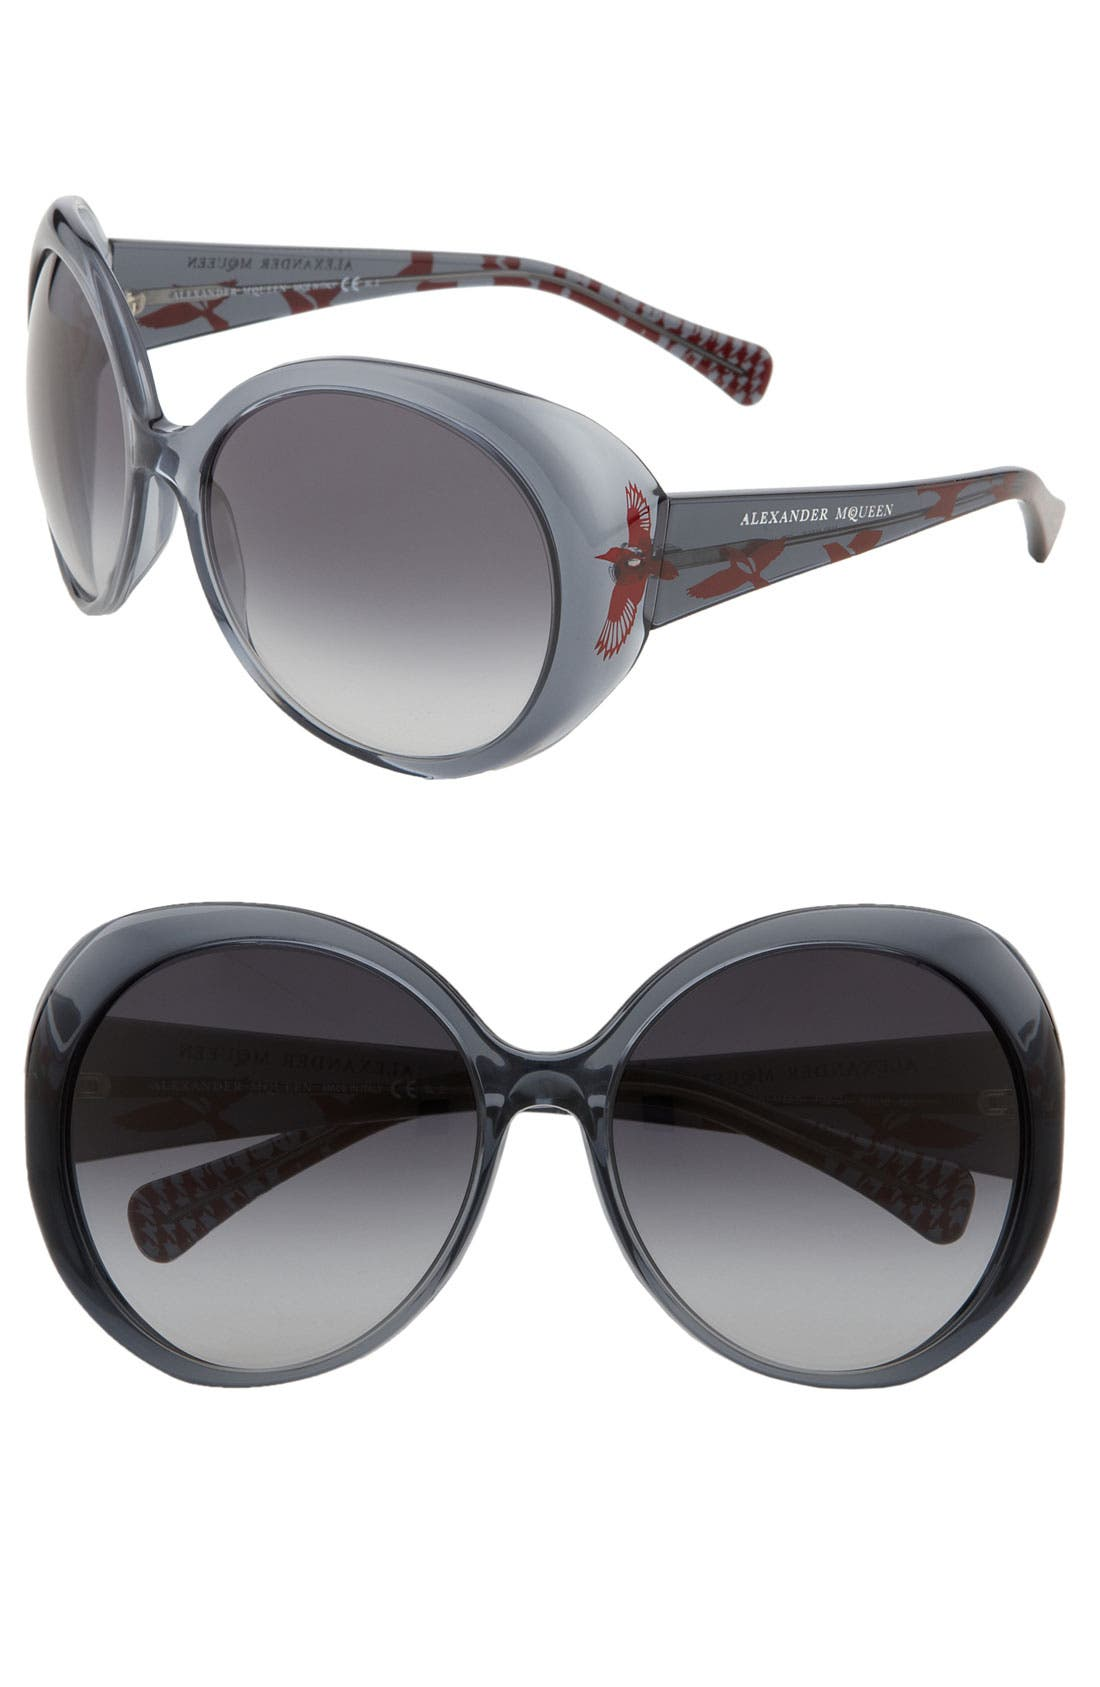 Alternate Image 1 Selected - Alexander McQueen 'Bird Design' Oversized Round Sunglasses